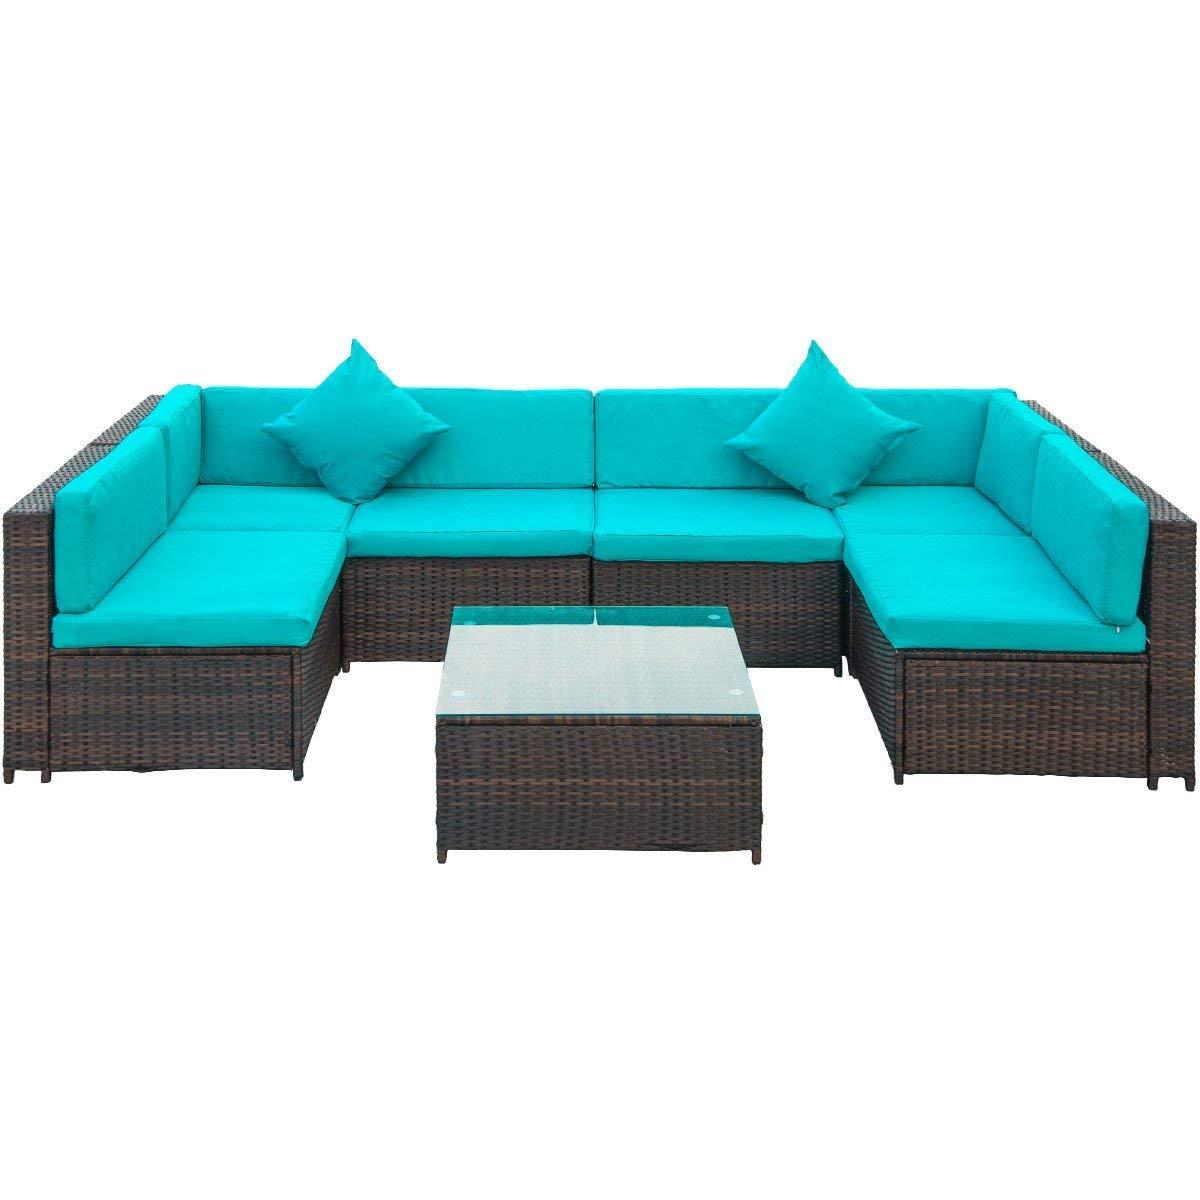 LZ LEISURE ZONE Merax Patio Furniture Set PE Rattan Sectional Garden  Furniture Corner Sofa Set (7 Pieces, Blue)